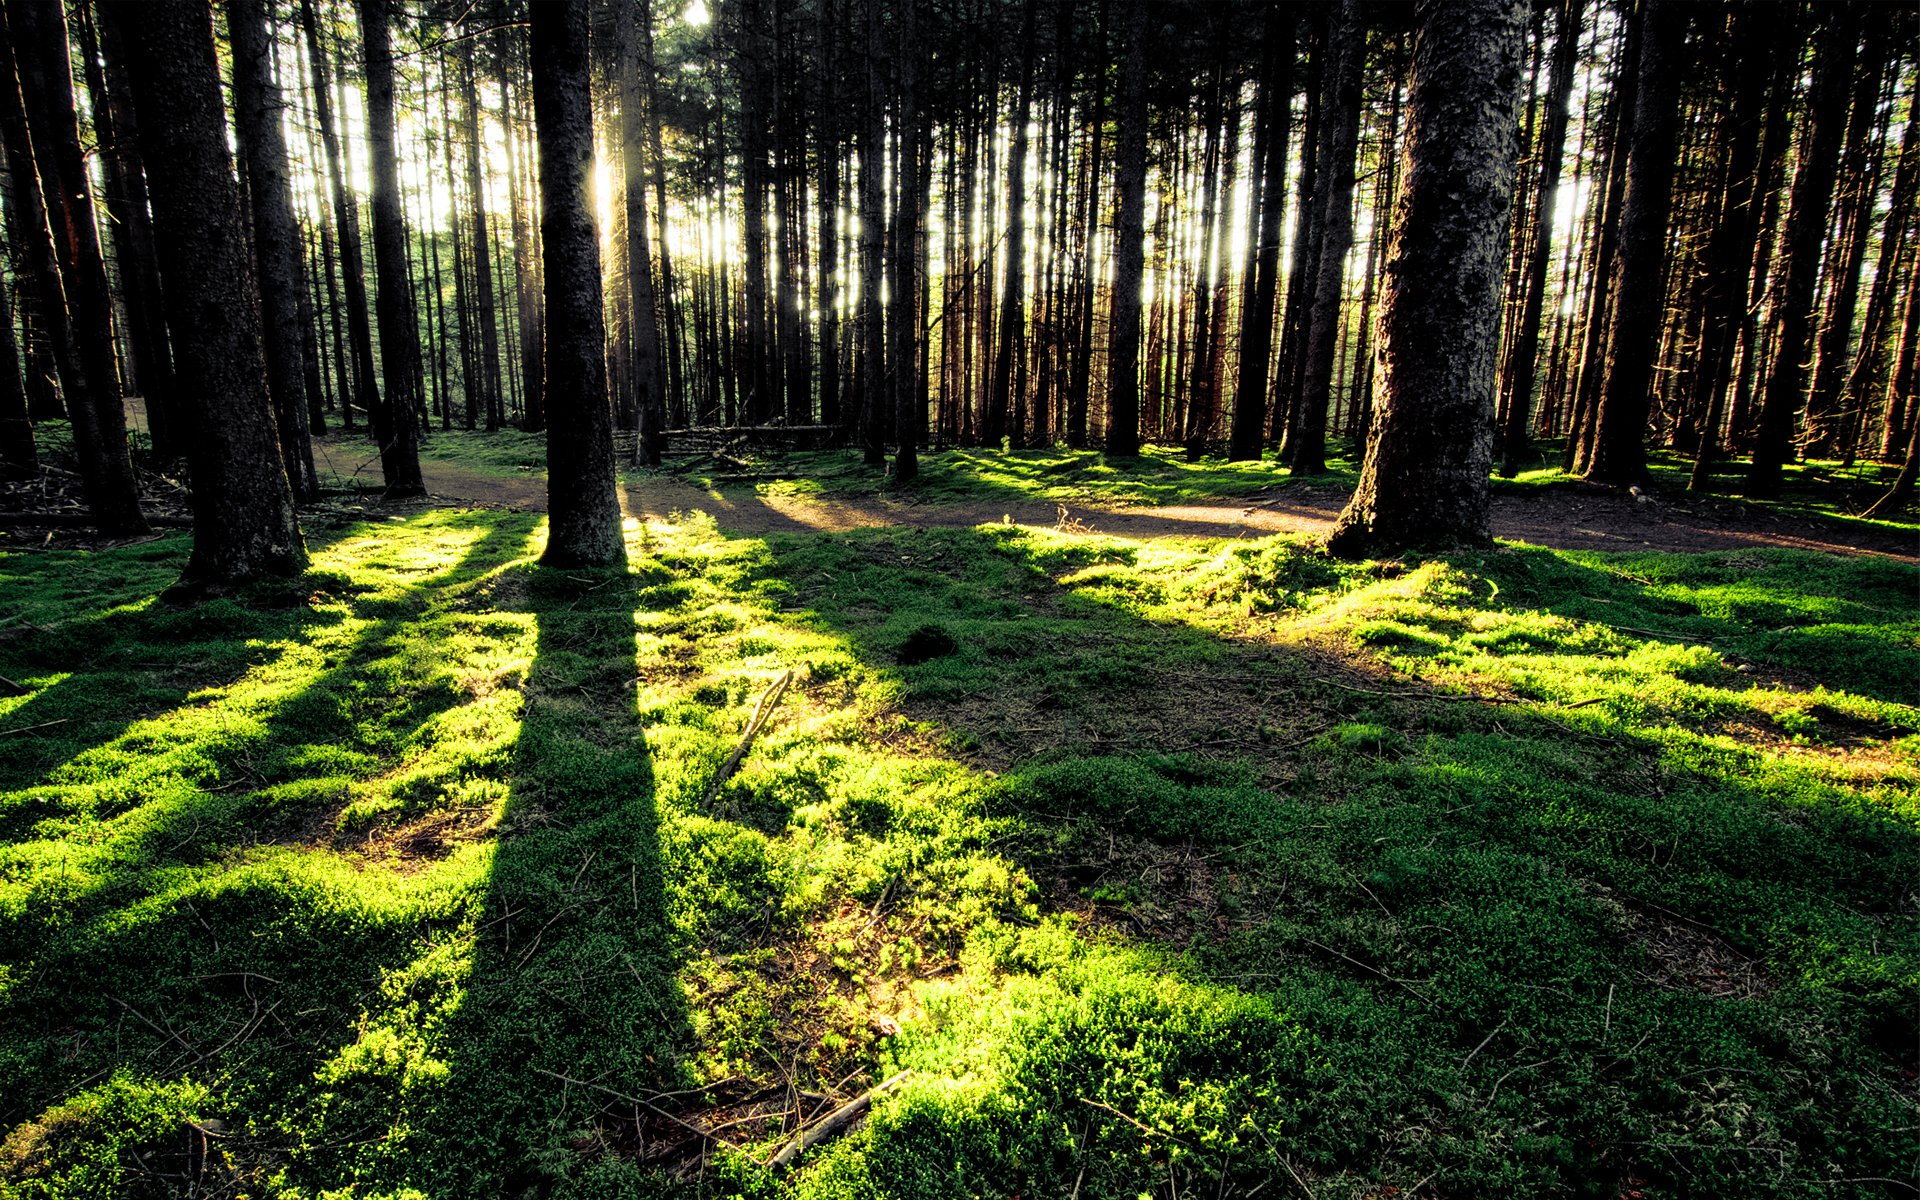 Wald Hd